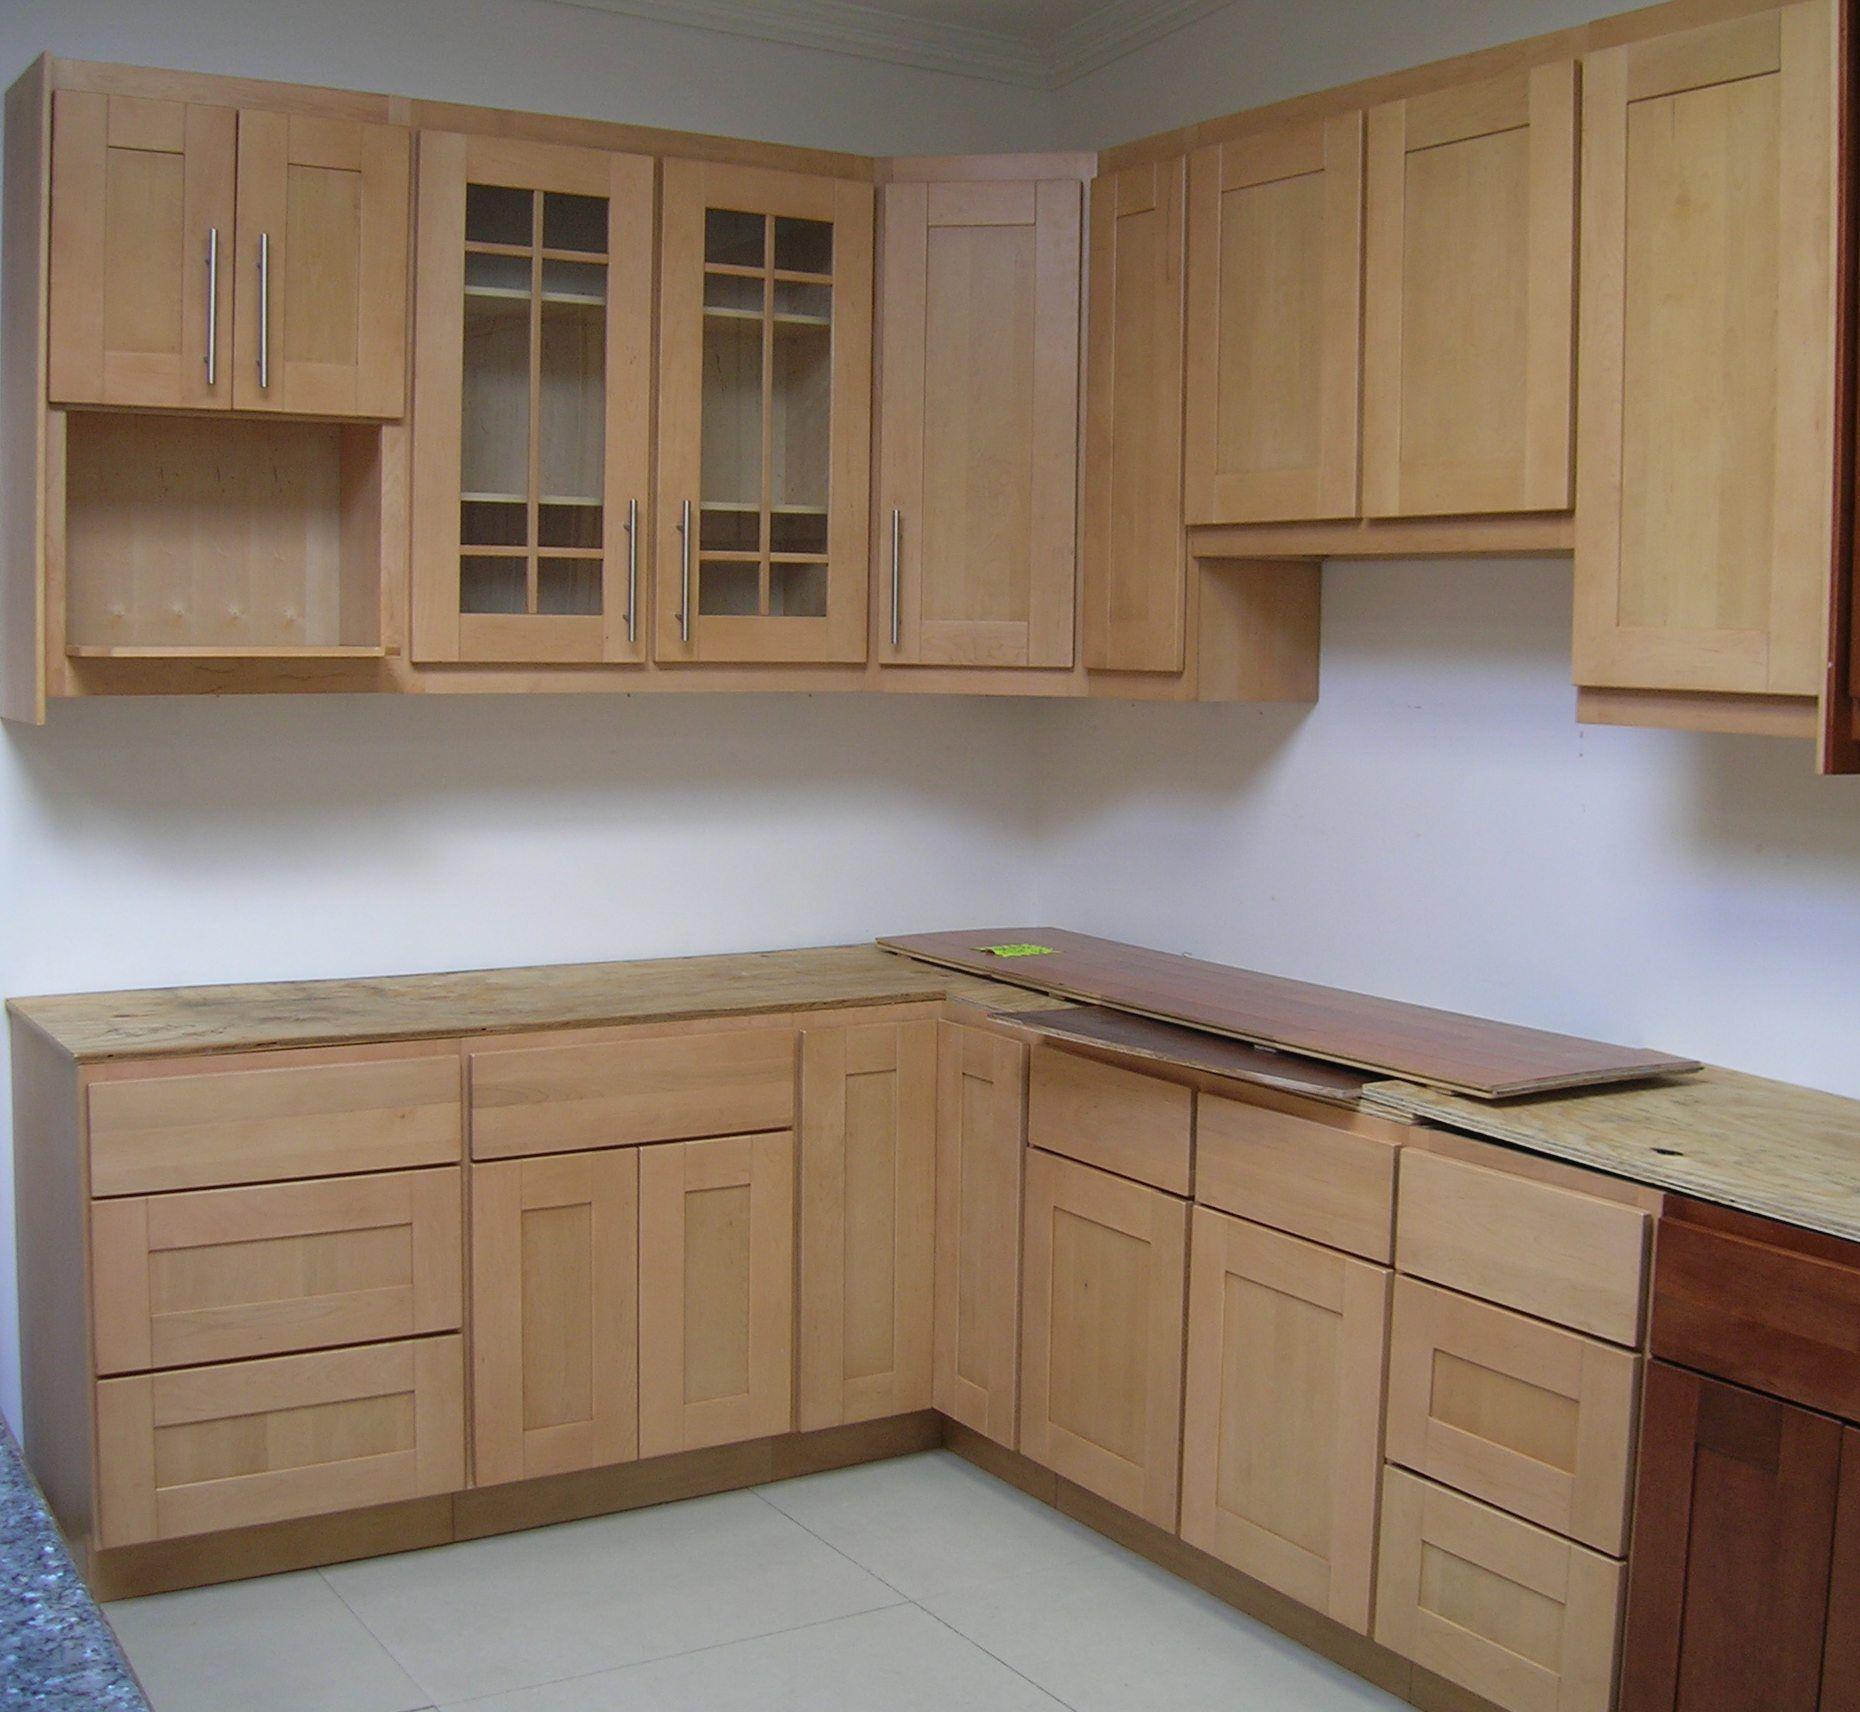 kitchen cabinets kitchen cabinet outlet kitchen cabinets diy